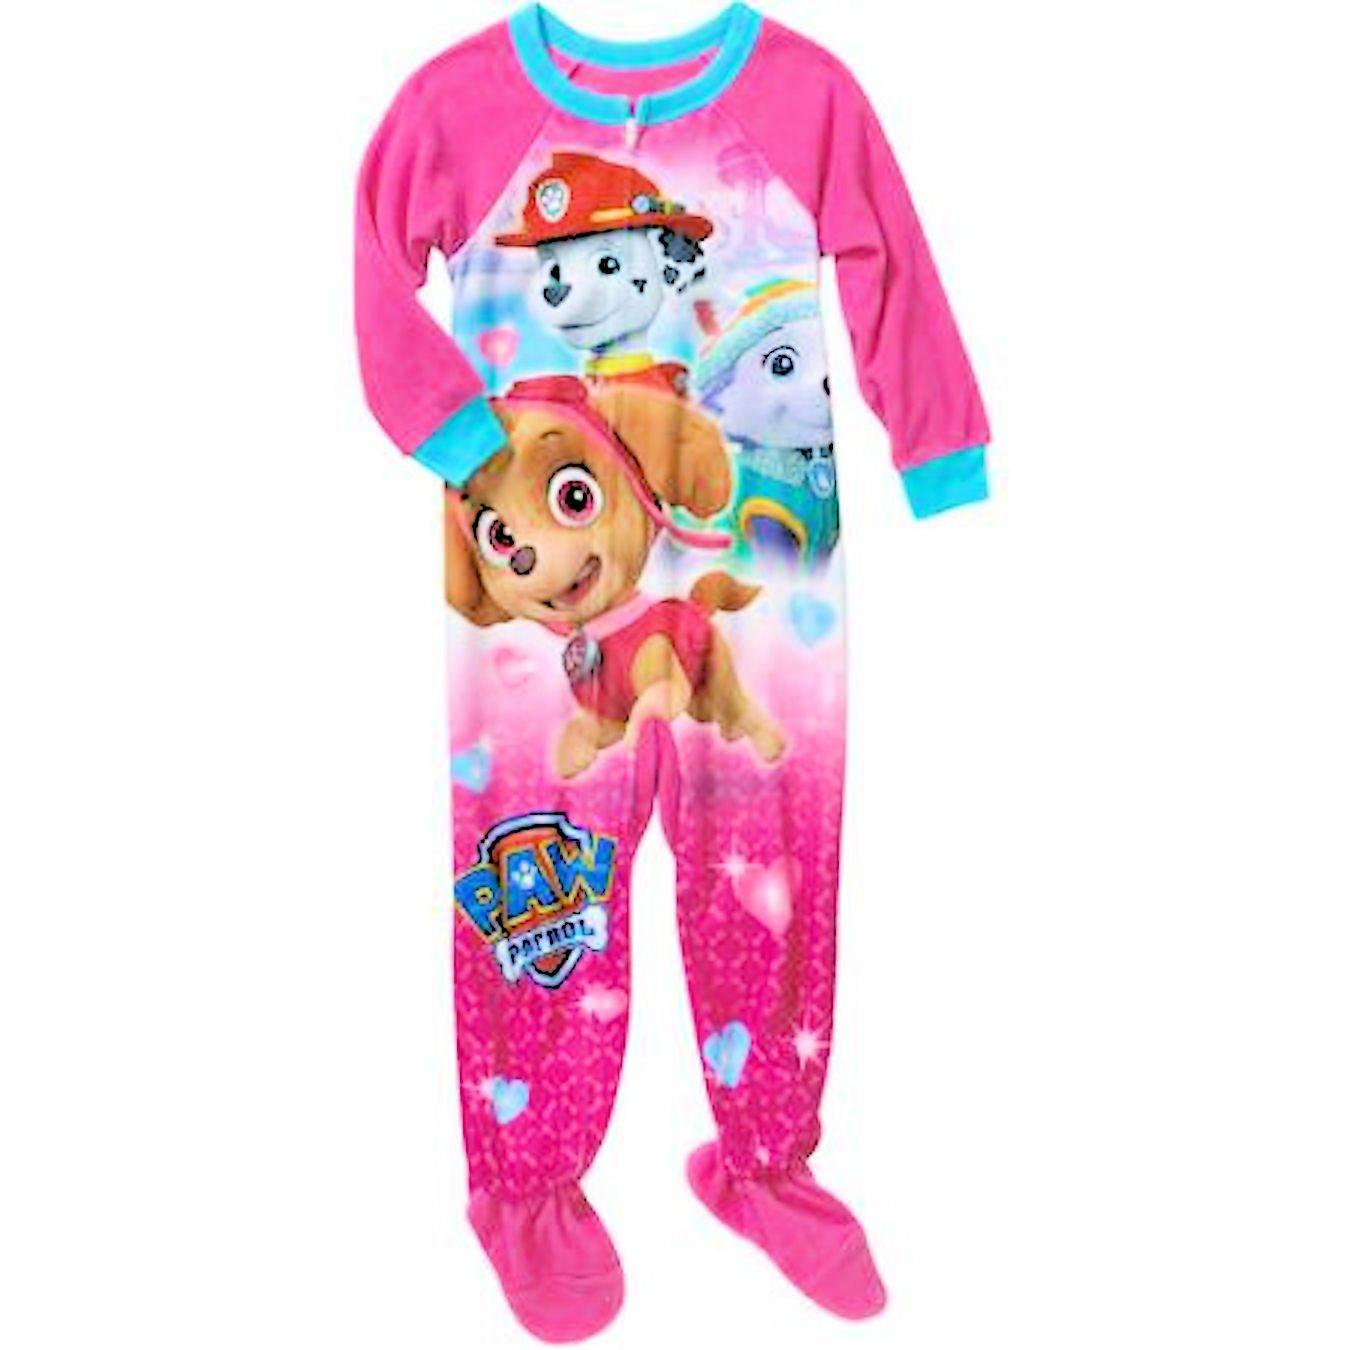 Paw Patrol Sky and Marshall Little Girls Footed Blanket Sleeper Pajama Everest